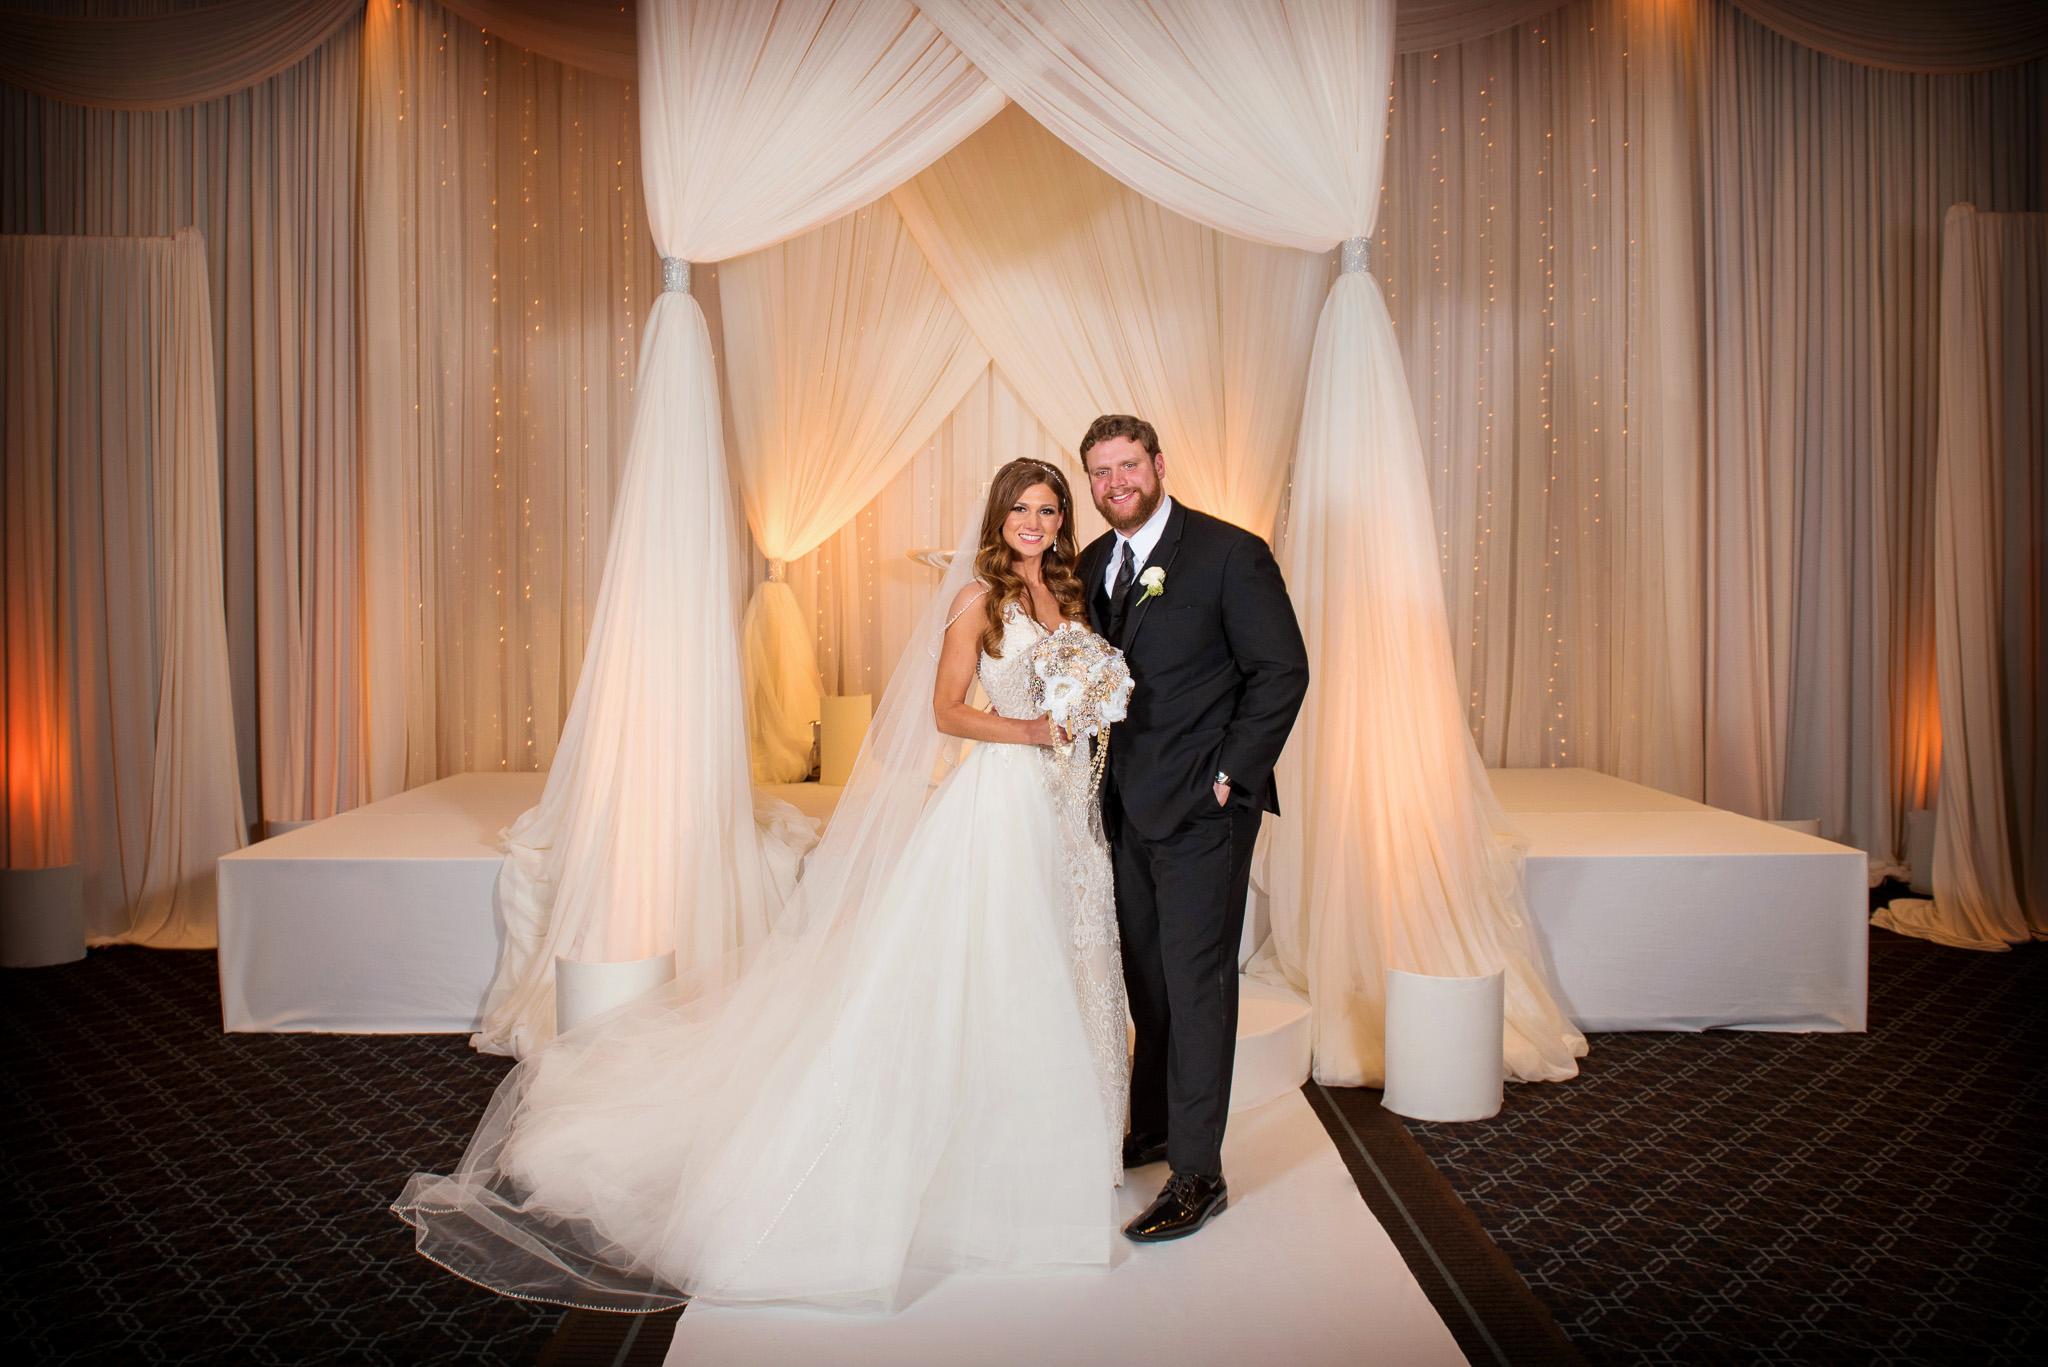 Rachel & Teddy's Wedding at Hotel Arista